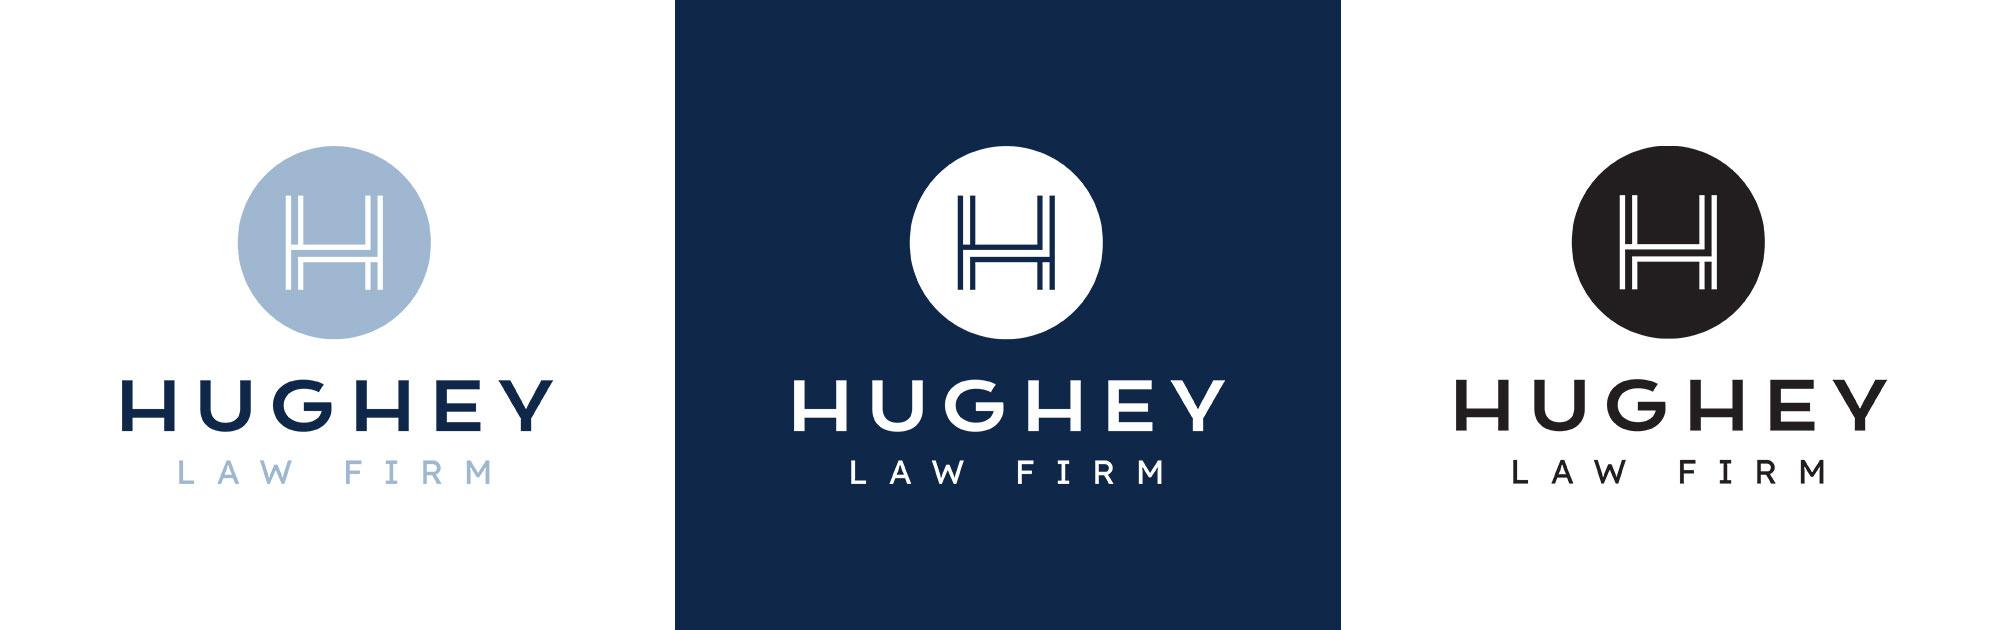 Hughey logo in full color, white and black